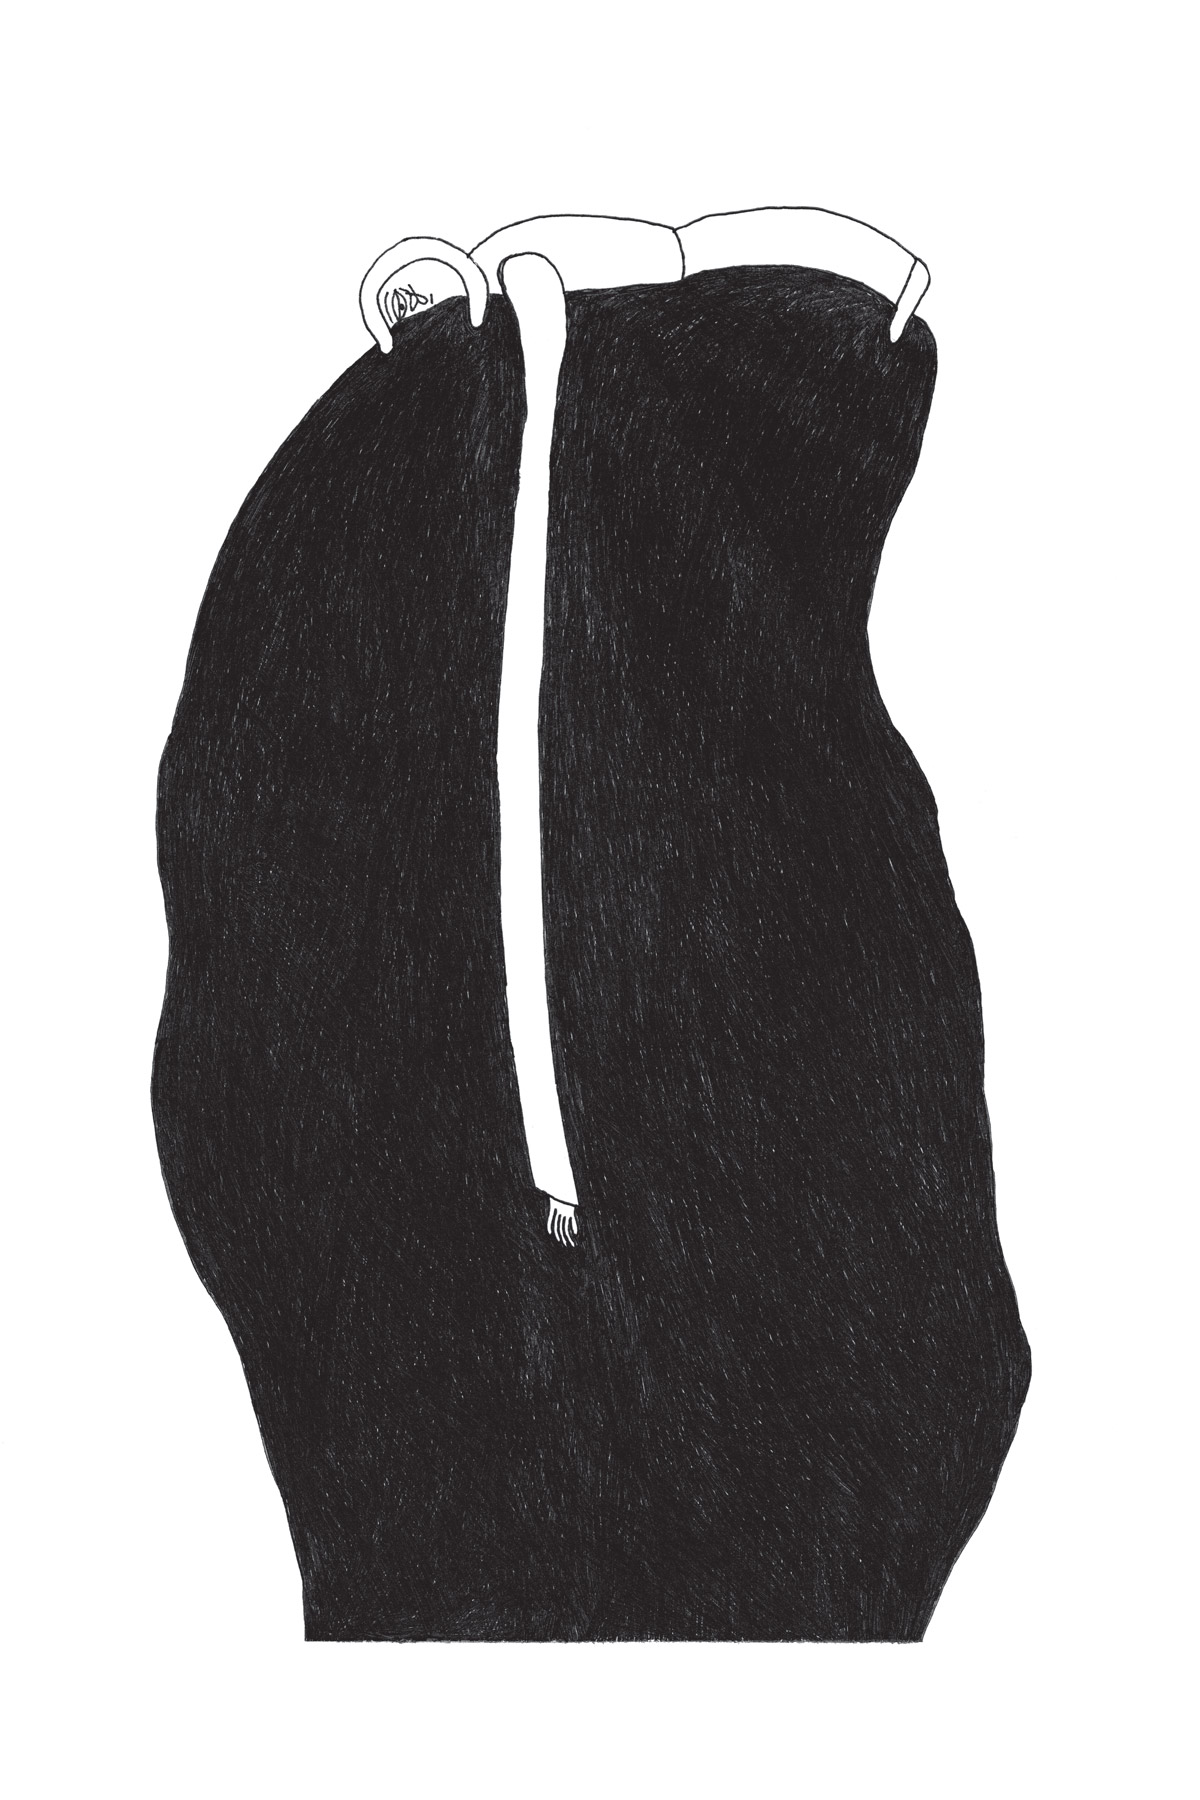 Jen Uman